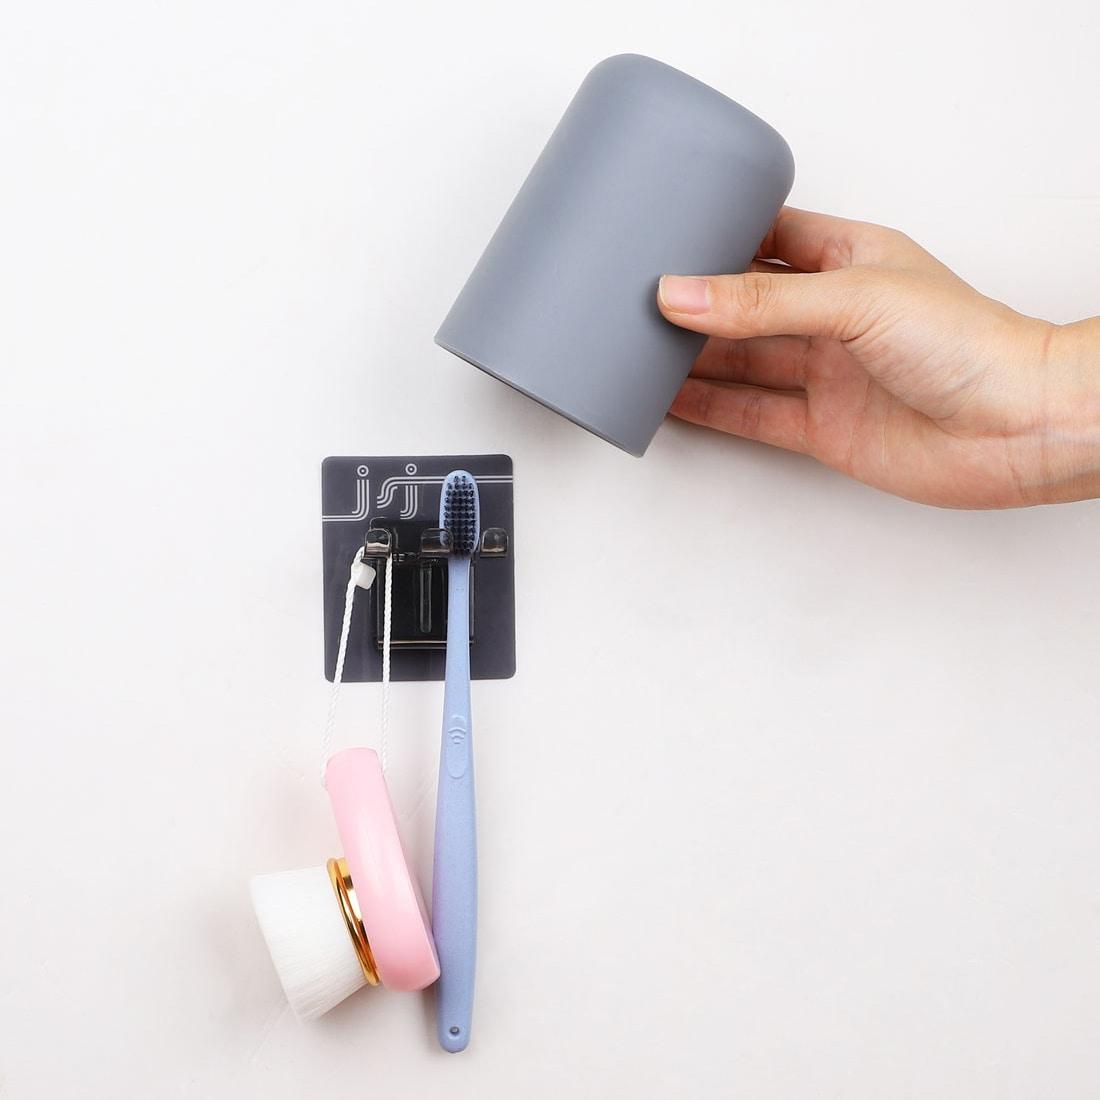 Shop Toothbrush Holder Wall Mount Anti Dust Toothbrush Washing Storage Set 2 8 X 4 1 Overstock 28386662 Light Grey